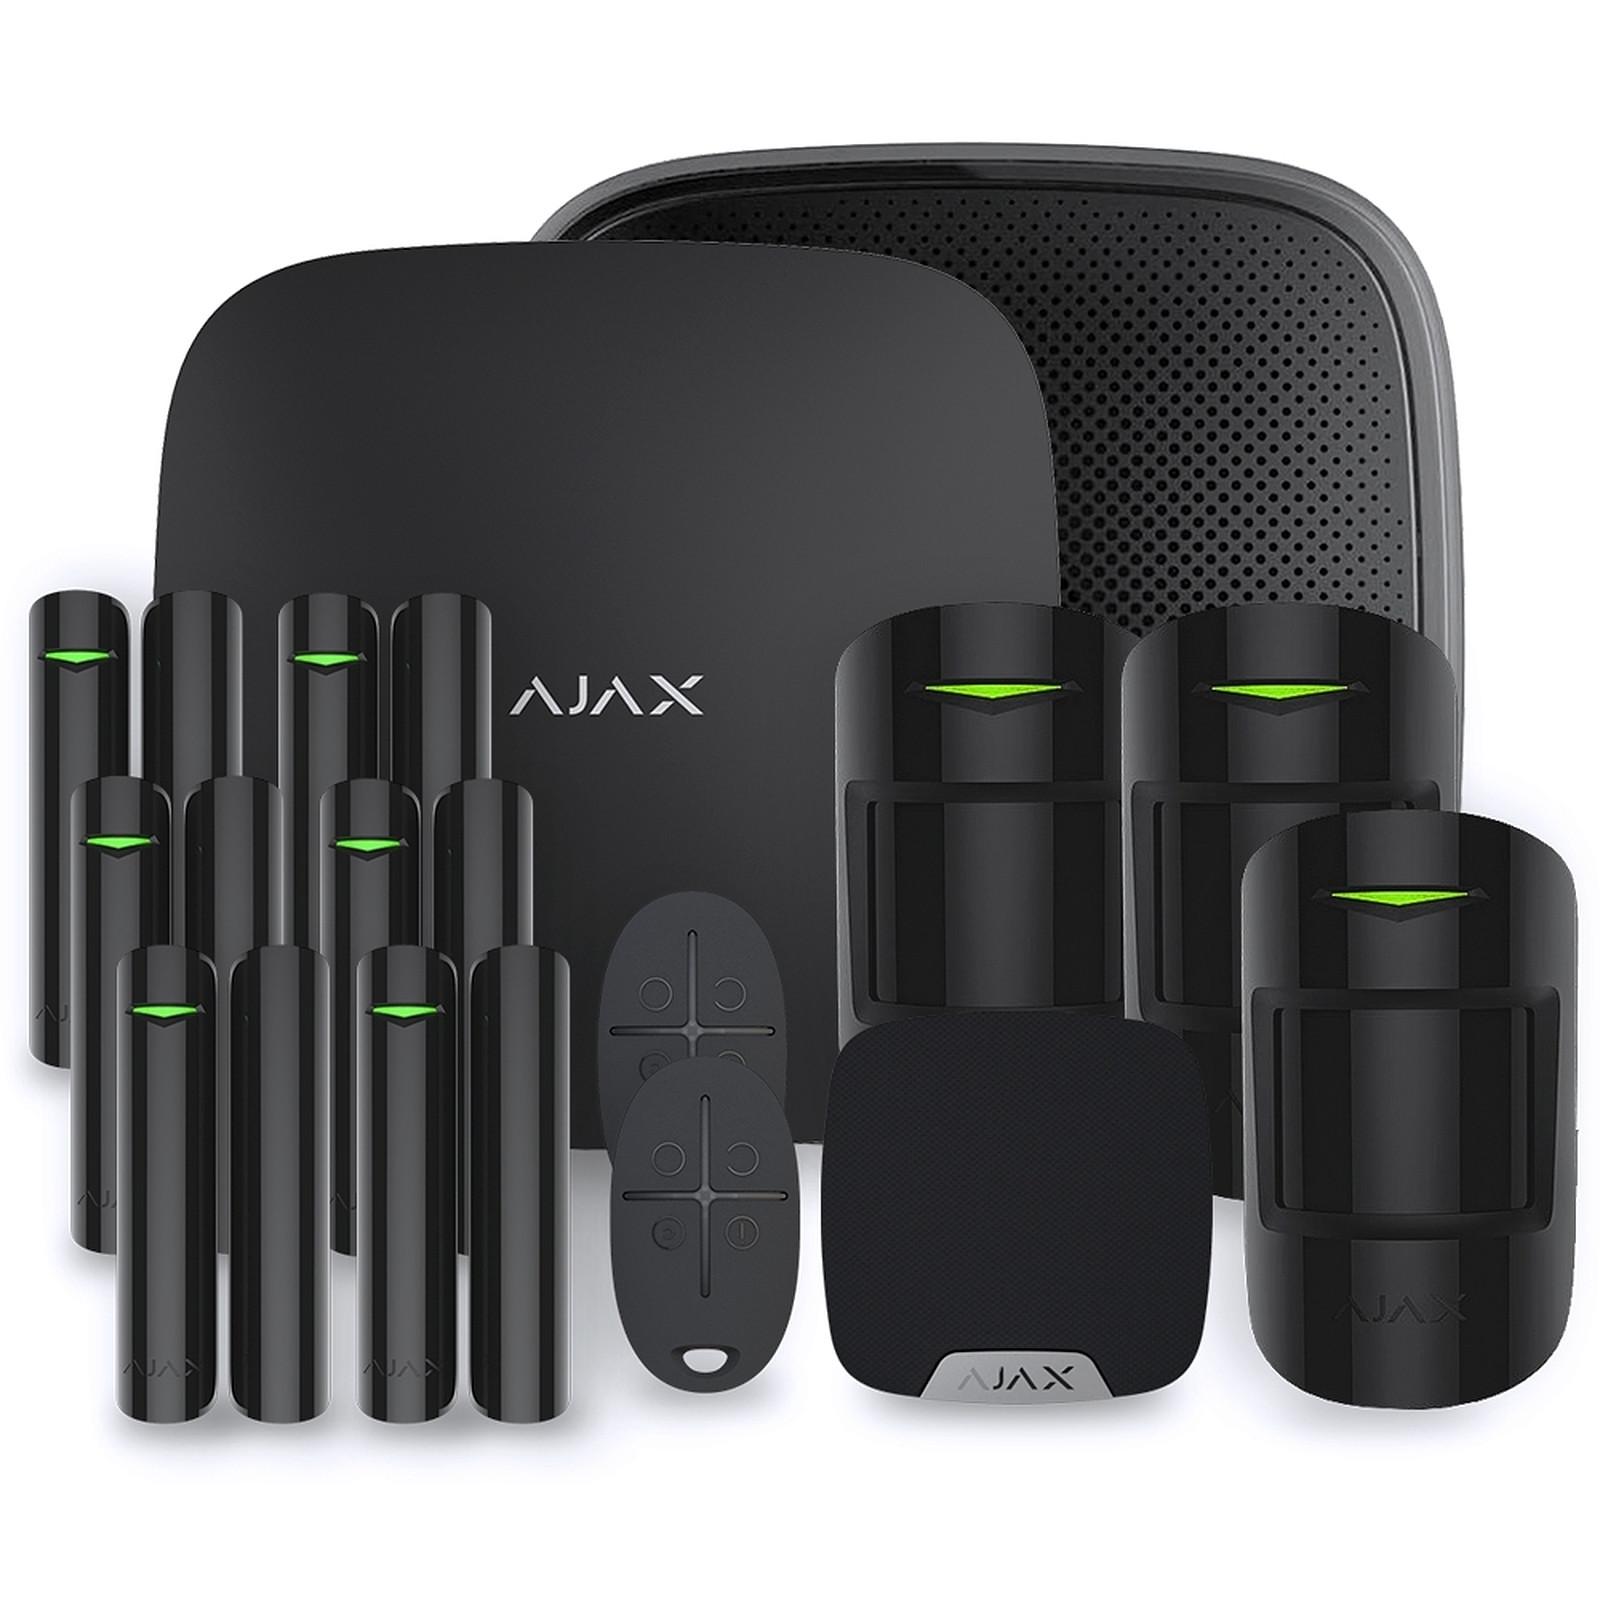 Ajax Alarme maison StarterKit noir  Kit 5